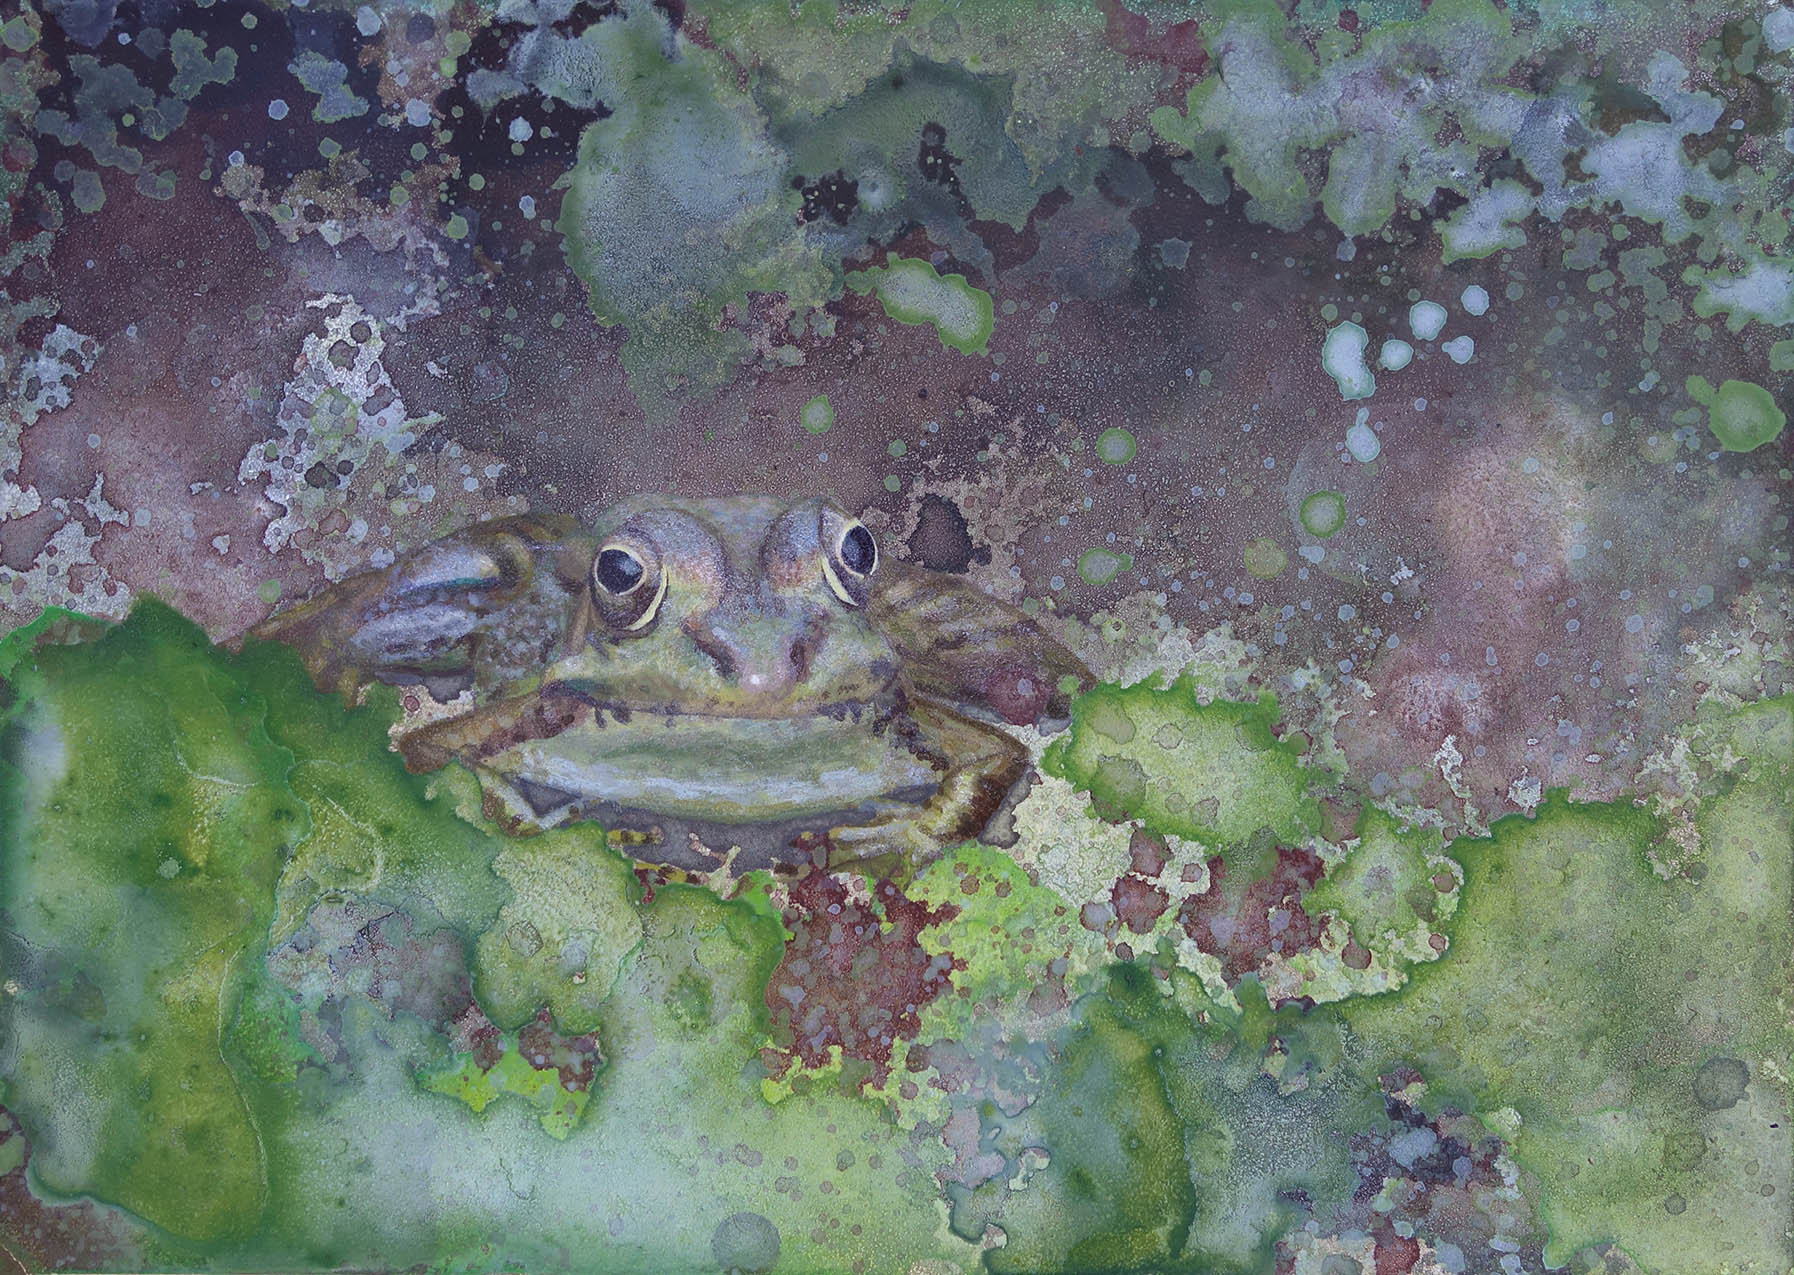 Shelby Prindaville painting frog marsh Rana ridibunda artwork acrylic artist.jpg